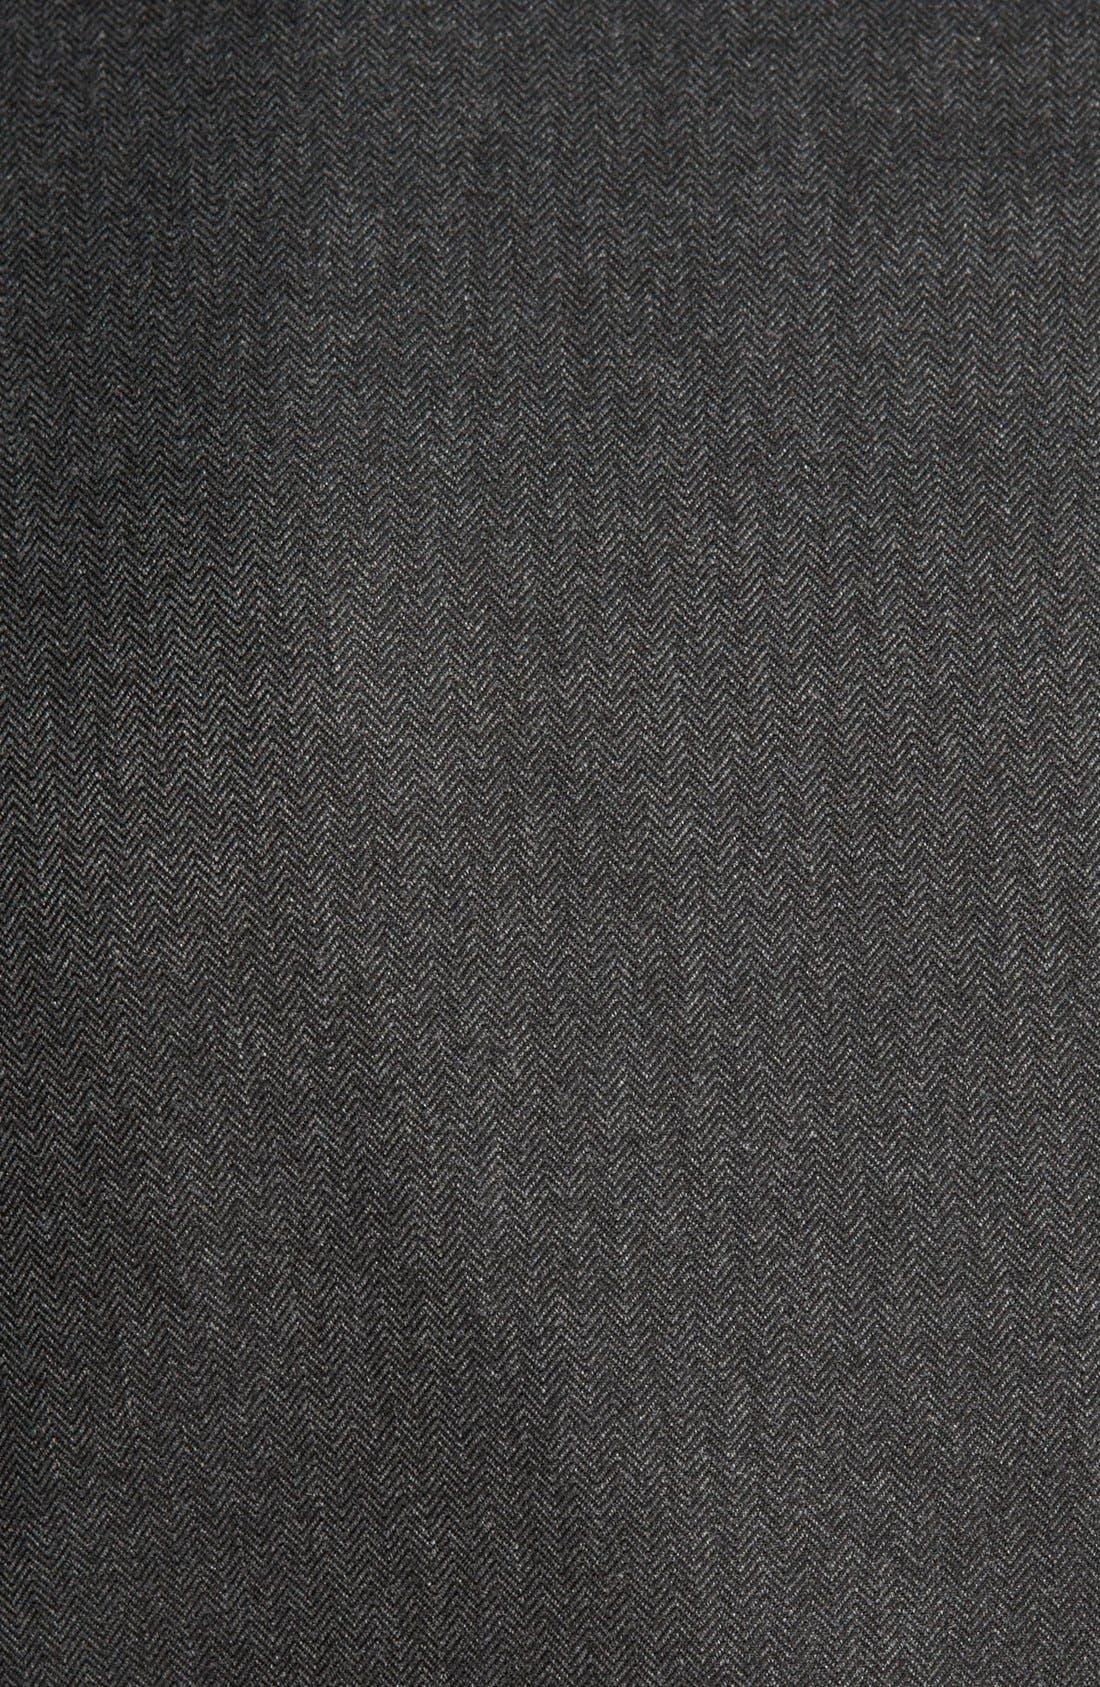 Alternate Image 3  - BOSS HUGO BOSS 'Coastes' Trim Fit Sportcoat